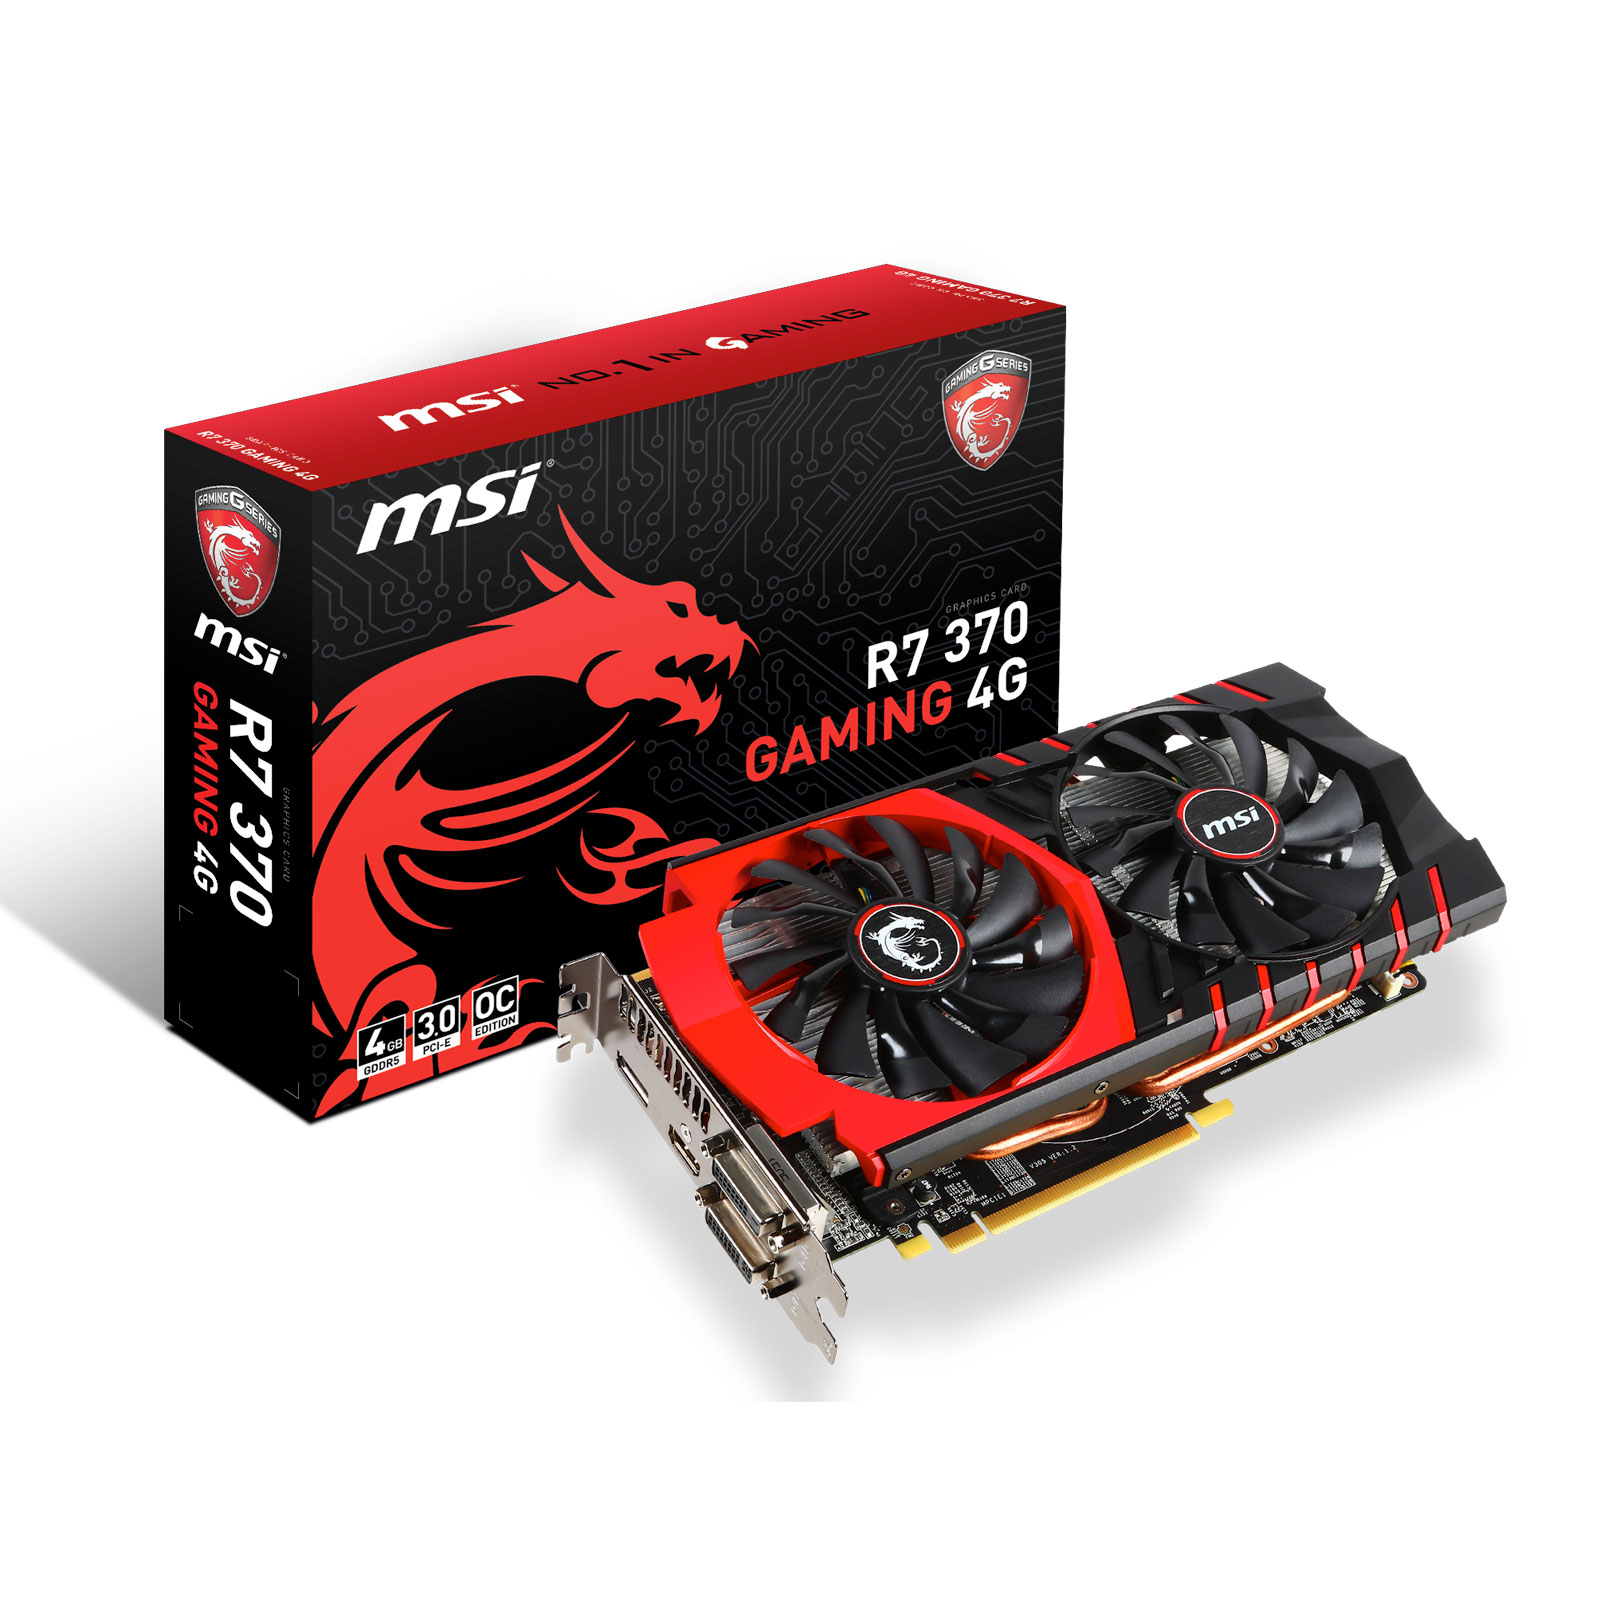 Carte graphique MSI Radeon R7 370 GAMING 4G 4 Go Dual DVI/HDMI/DisplayPort - PCI Express (AMD Radeon R7 370)